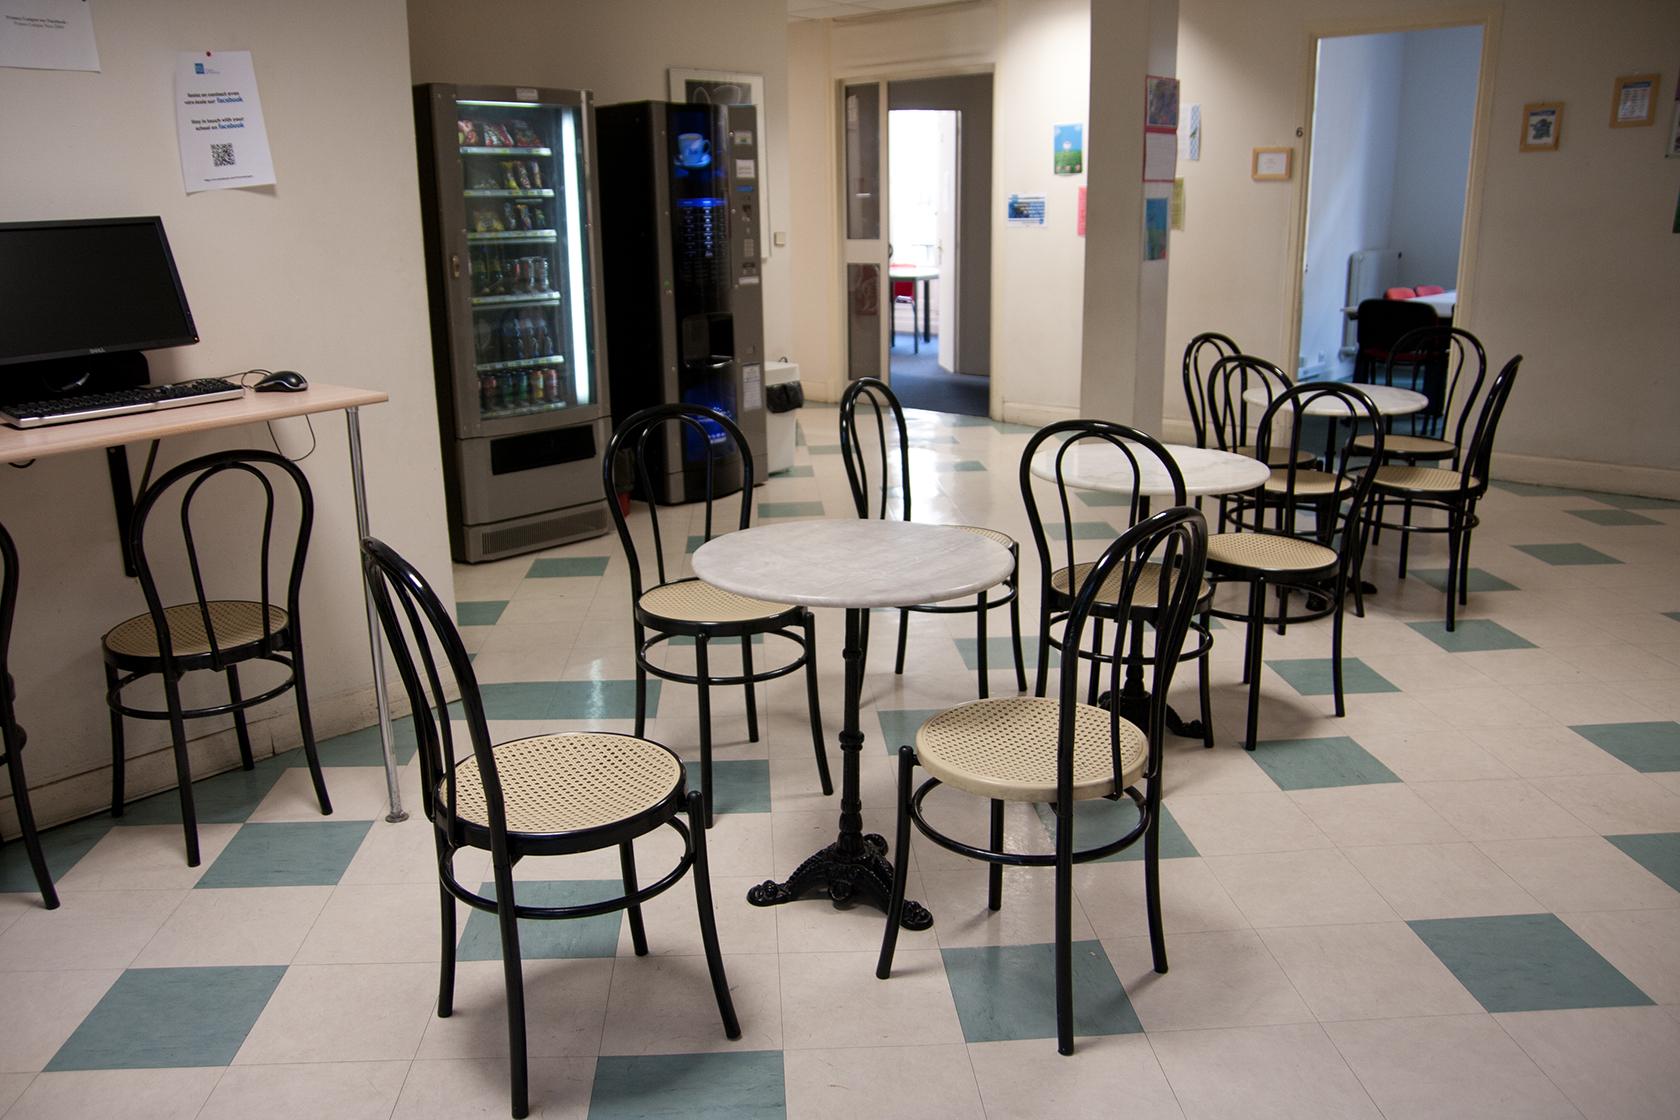 school-students-spaces